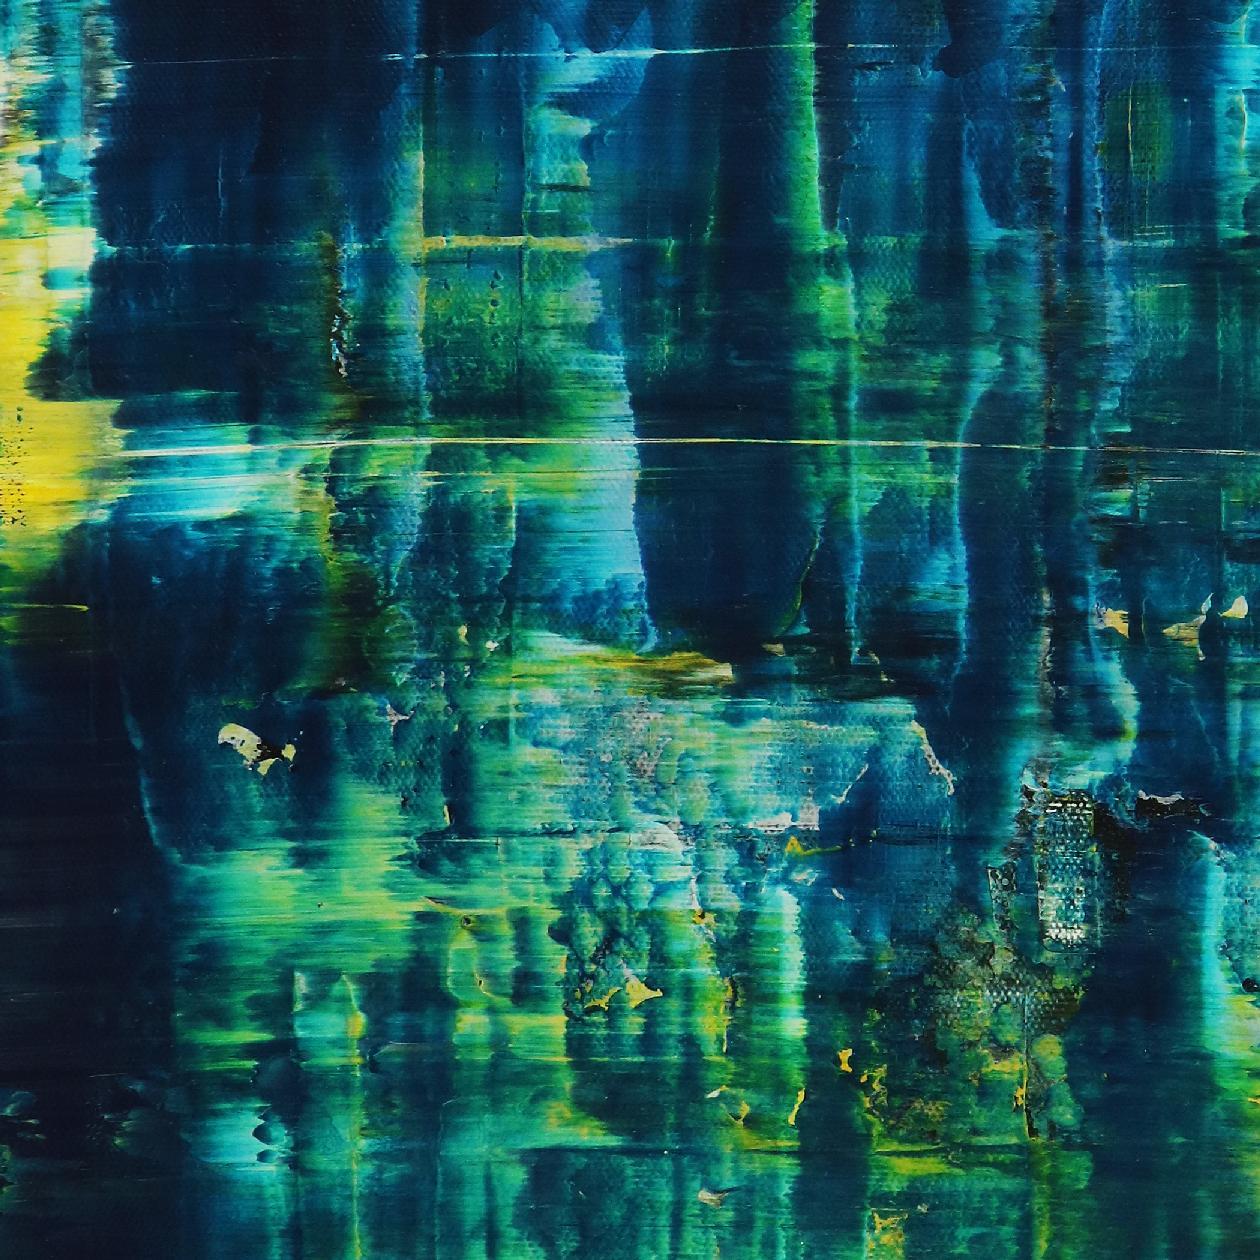 Emerald Forest Spectra 3 by Nestor Toro